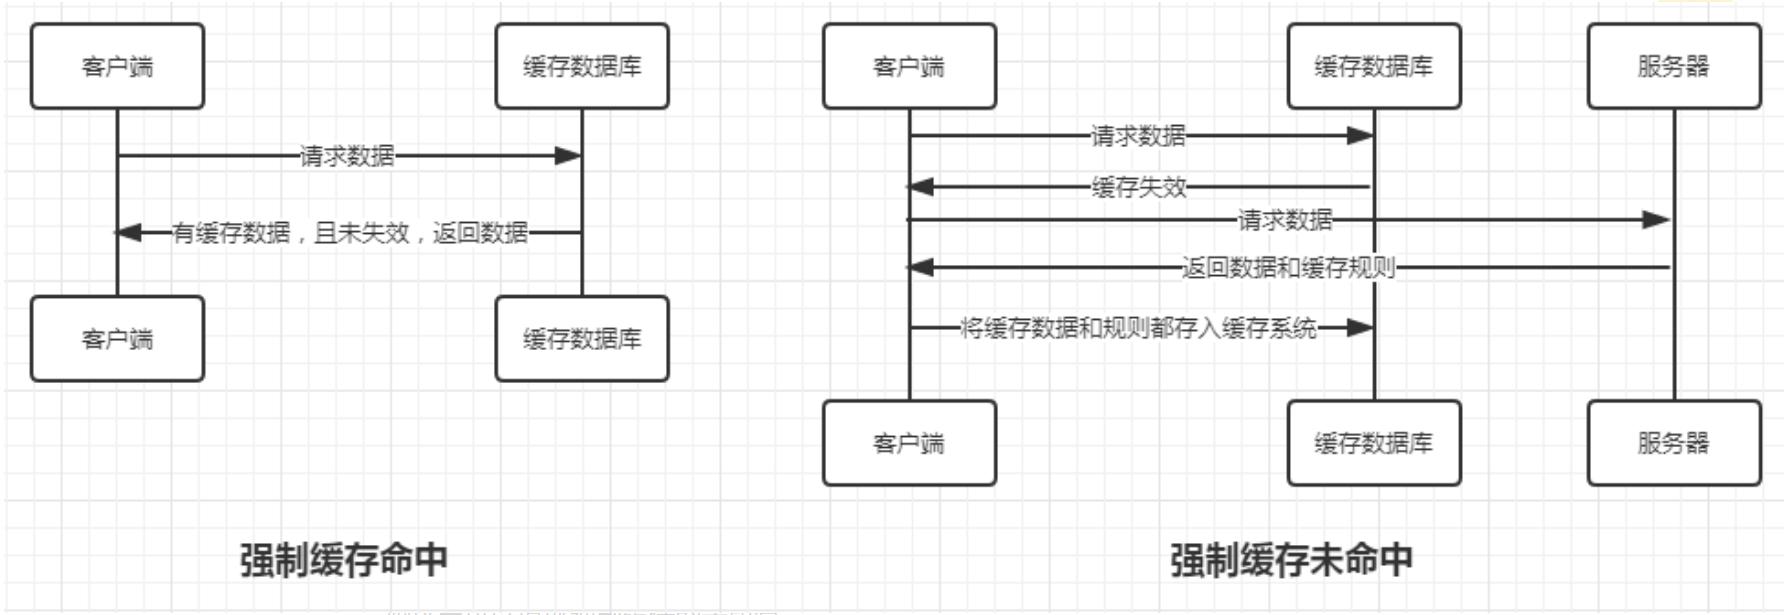 Nginx缓存机制详解 - 强制缓存示意图